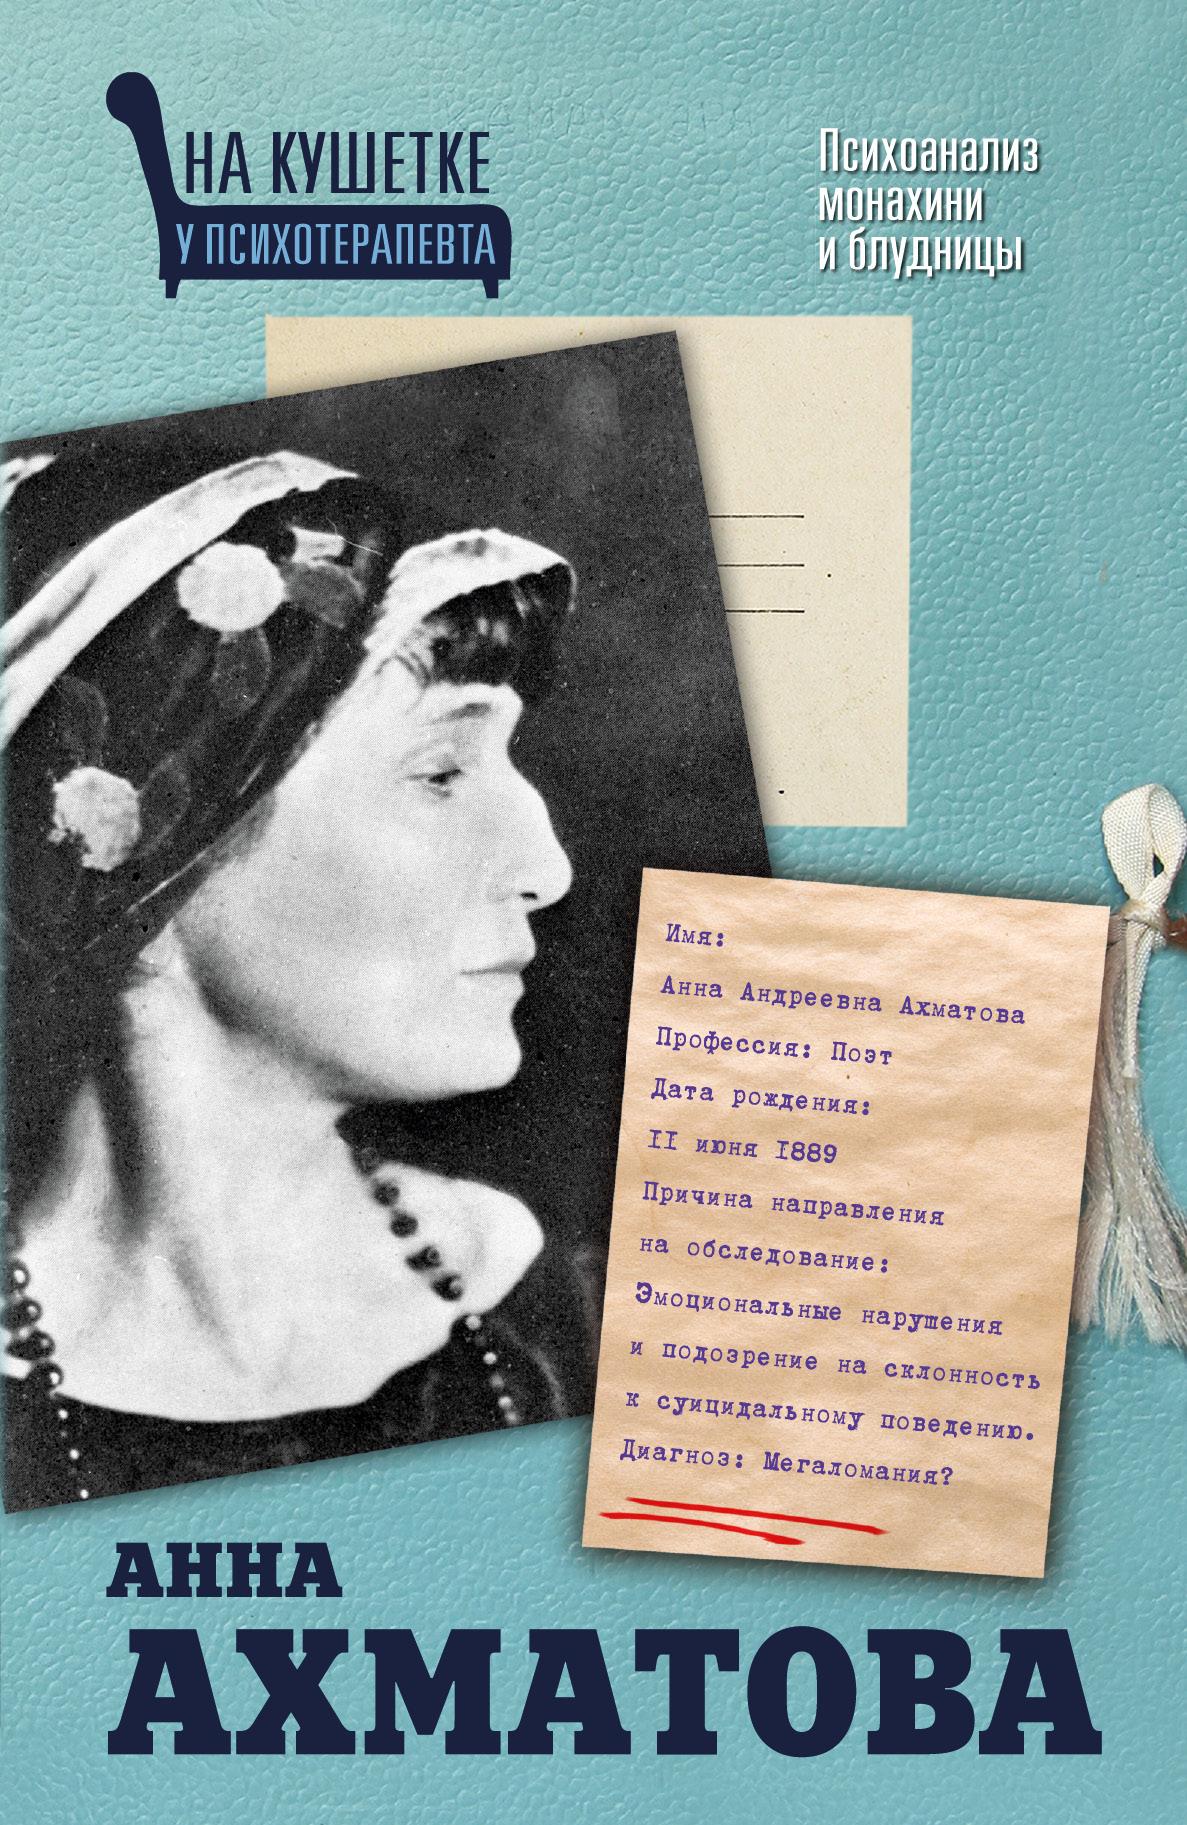 Мишаненкова Екатерина Александровна Анна Ахматова на кушетке стоимость